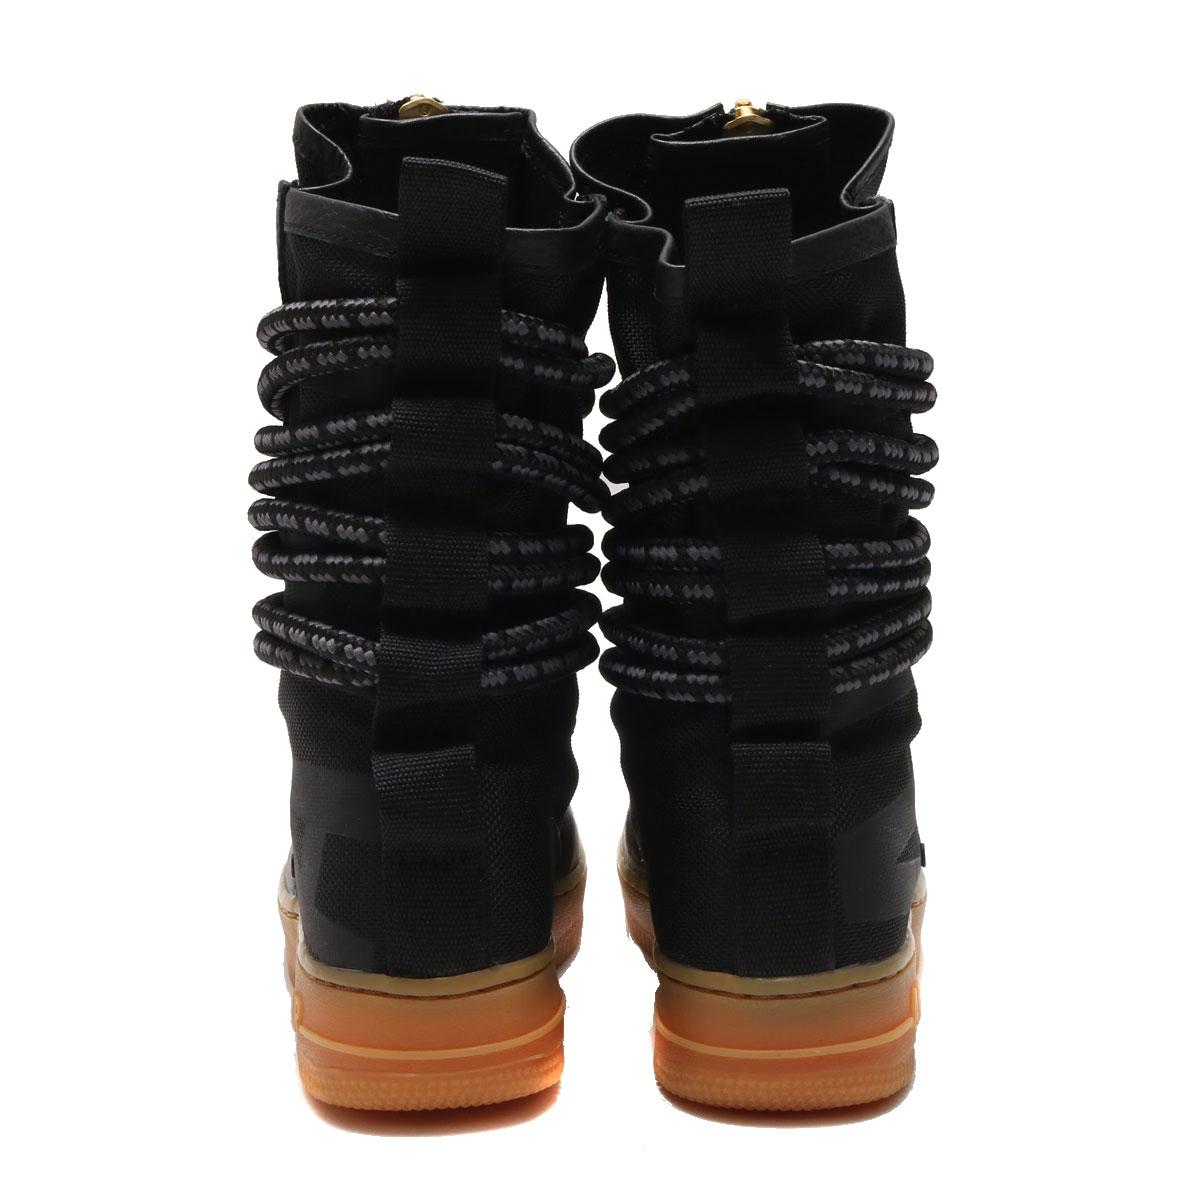 NIKE W SF AF1 HI (Nike women special field air force 1 high) (BLACK/BLACK- GUM LIGHT BROWN) 17HO-S